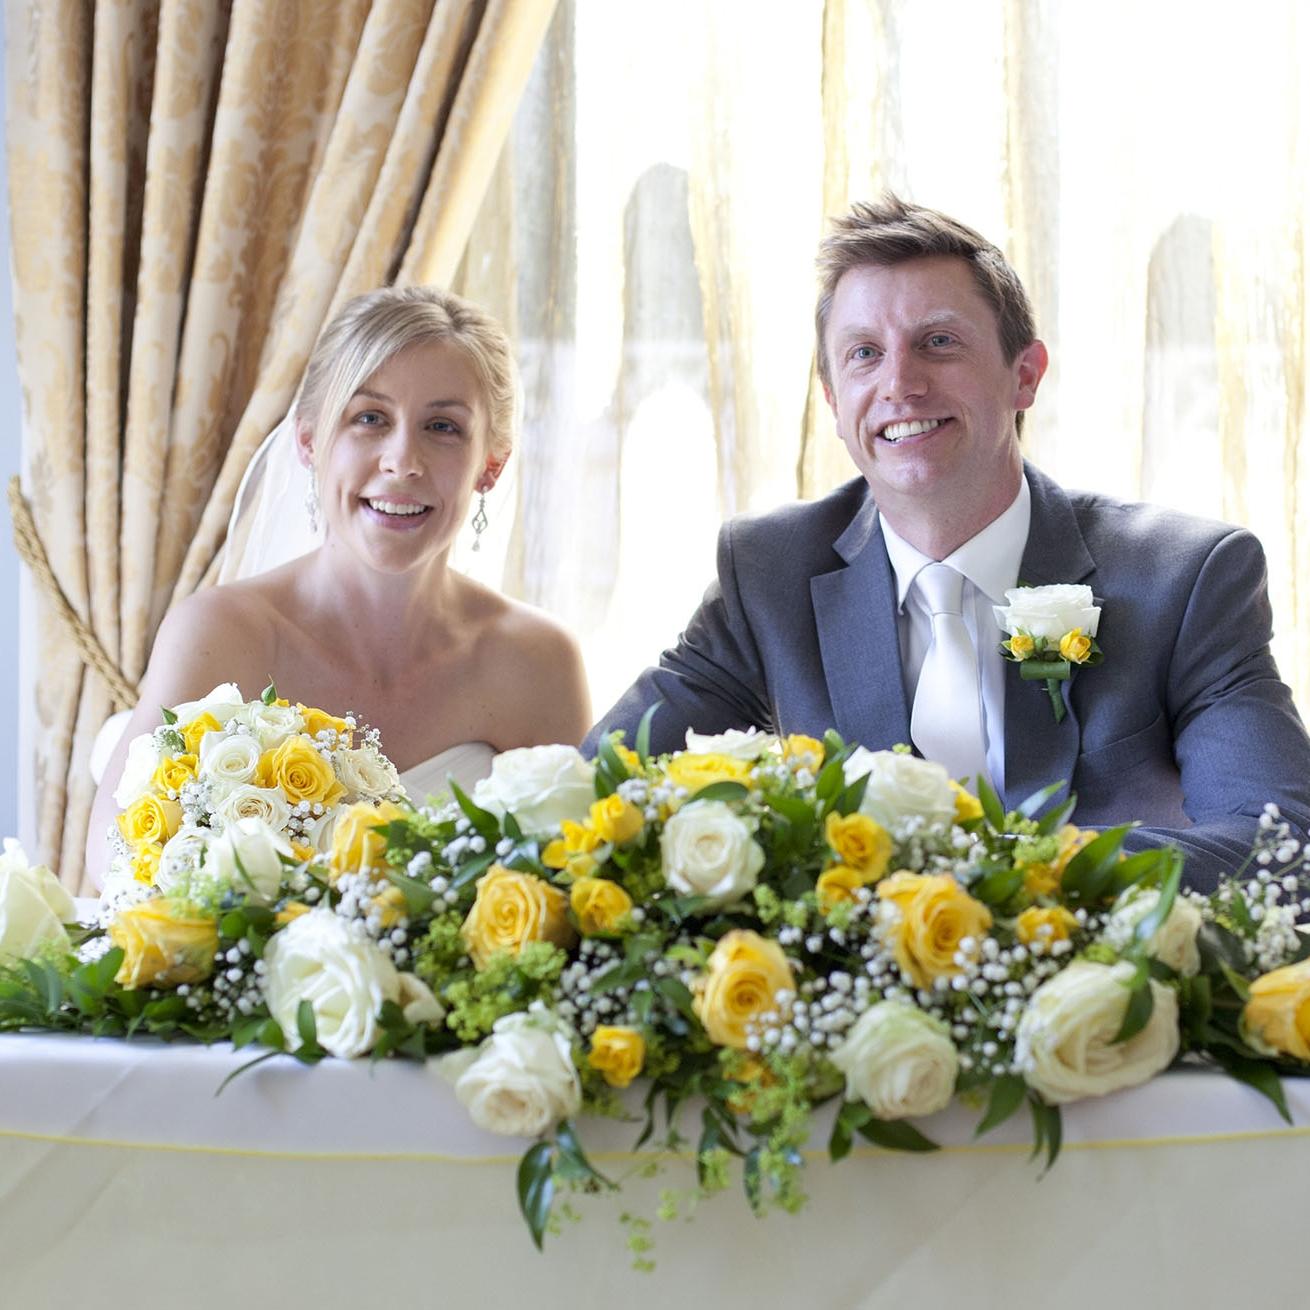 elizabethg_fineart_photography_hertfordshire_rachel_adam_wedding_highelmsmanor_26.jpg